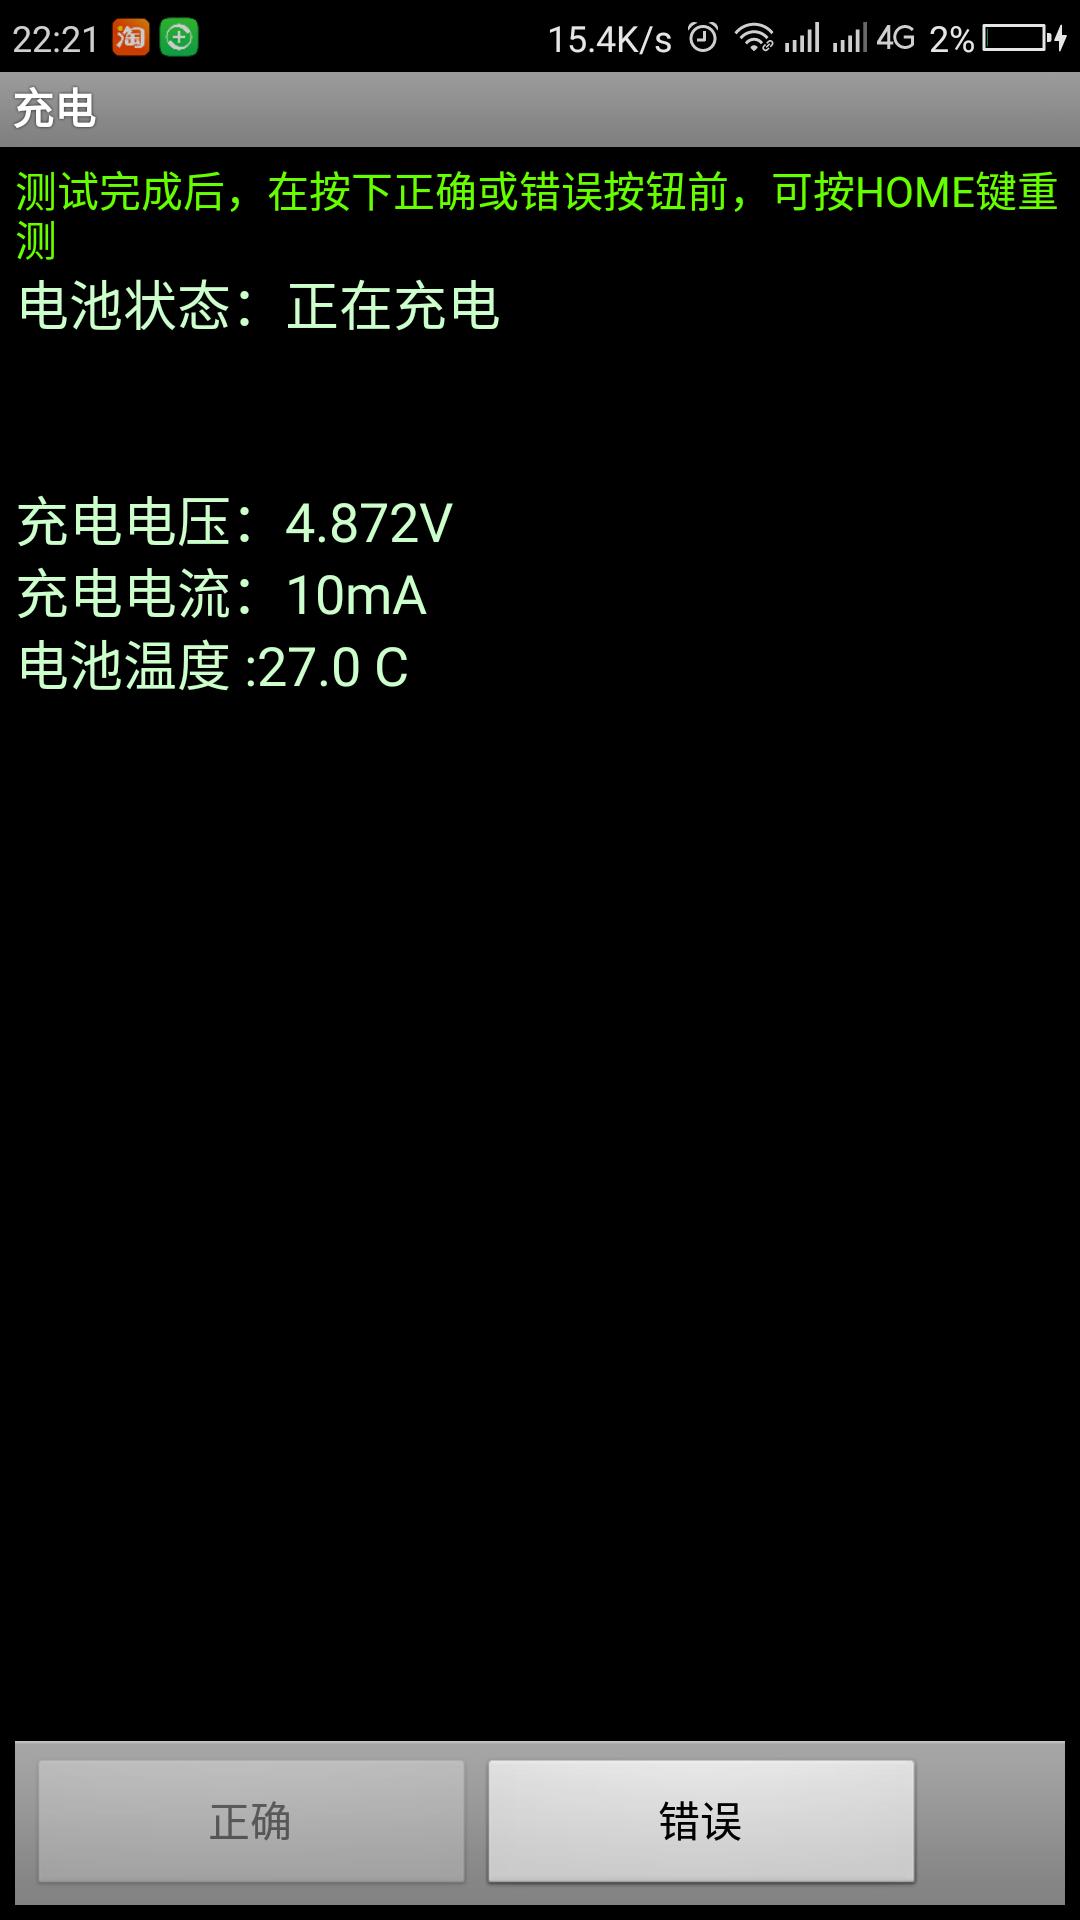 Screenshot_2018-10-17-22-21-52.png